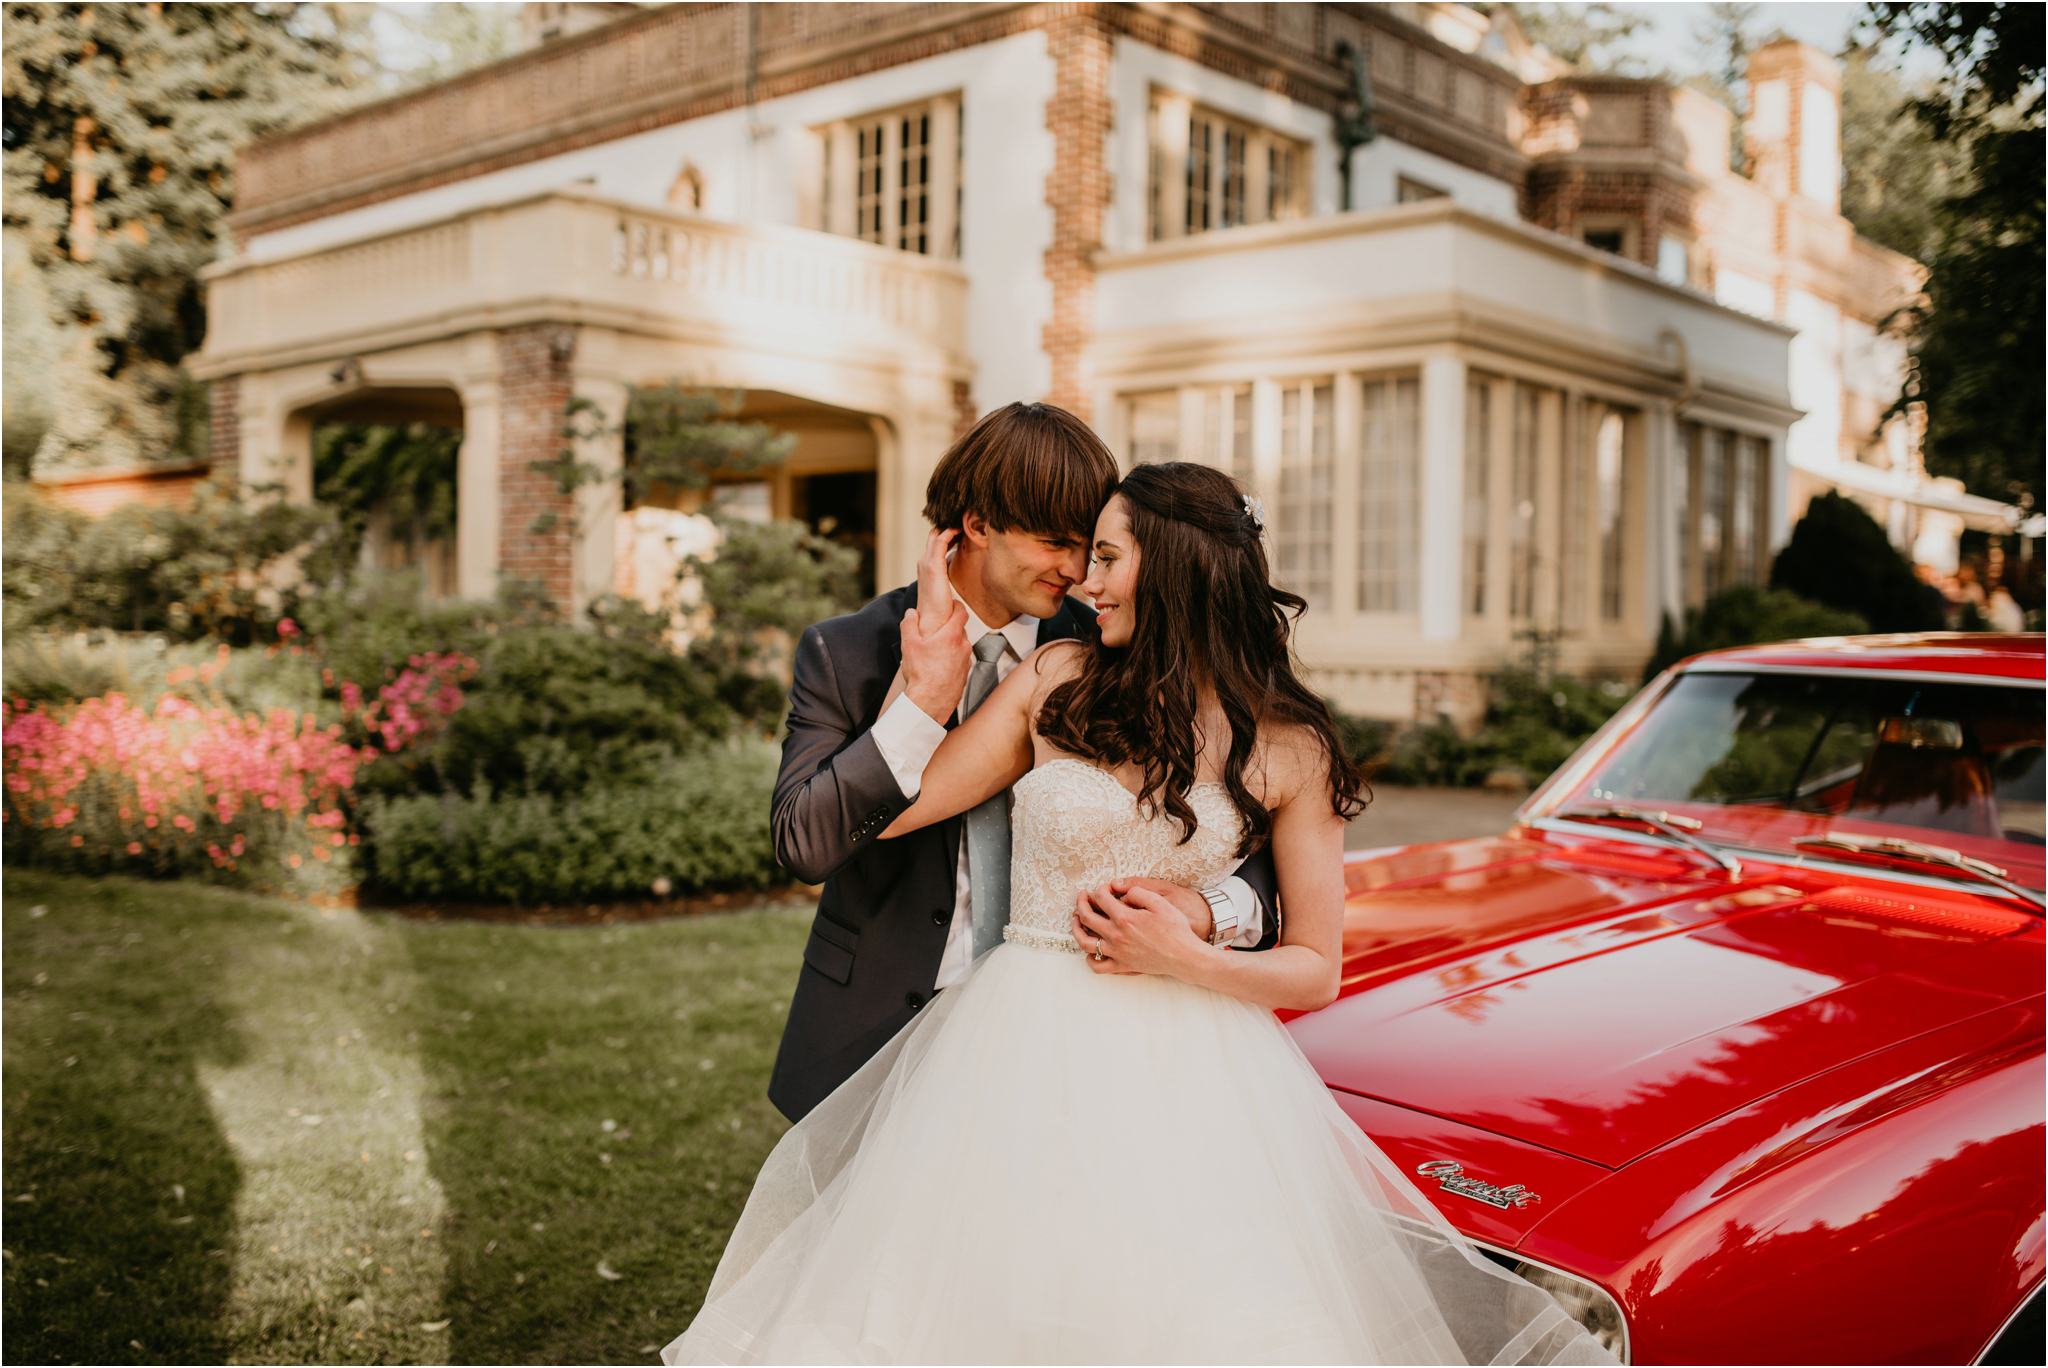 chance-and-ondrea-lairmont-manor-wedding-seattle-photographer-110.jpg